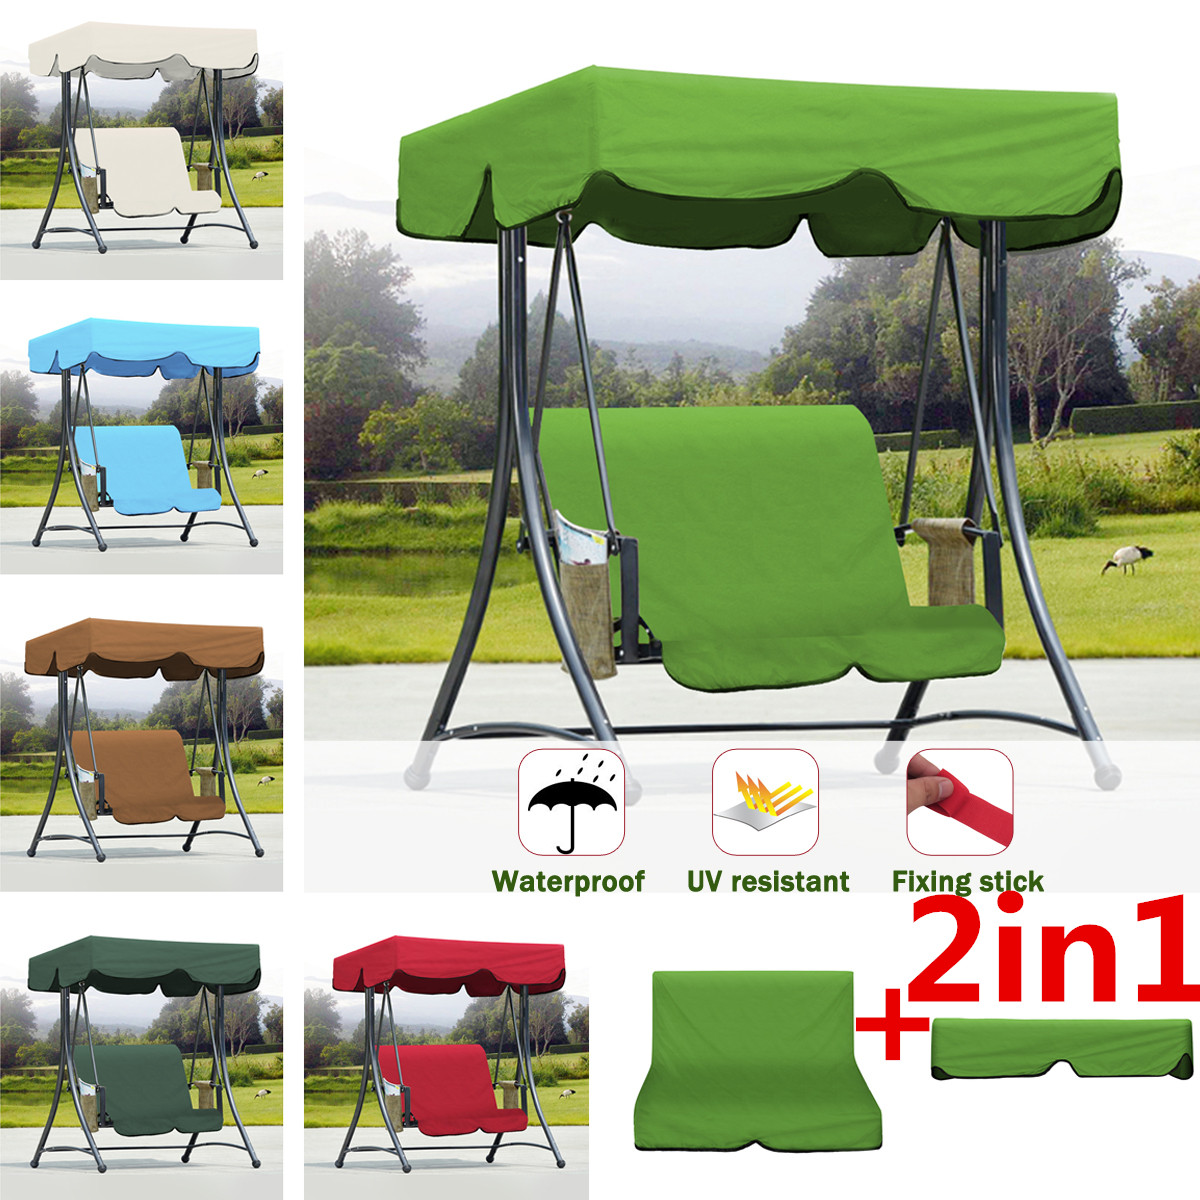 Outdoor Canopy Chair Rocking For Baby Room 2pcs Waterproof Uv Resistant Swing Hammock Cushion Summer Indoor Garden Courtyard Tent Top Cover